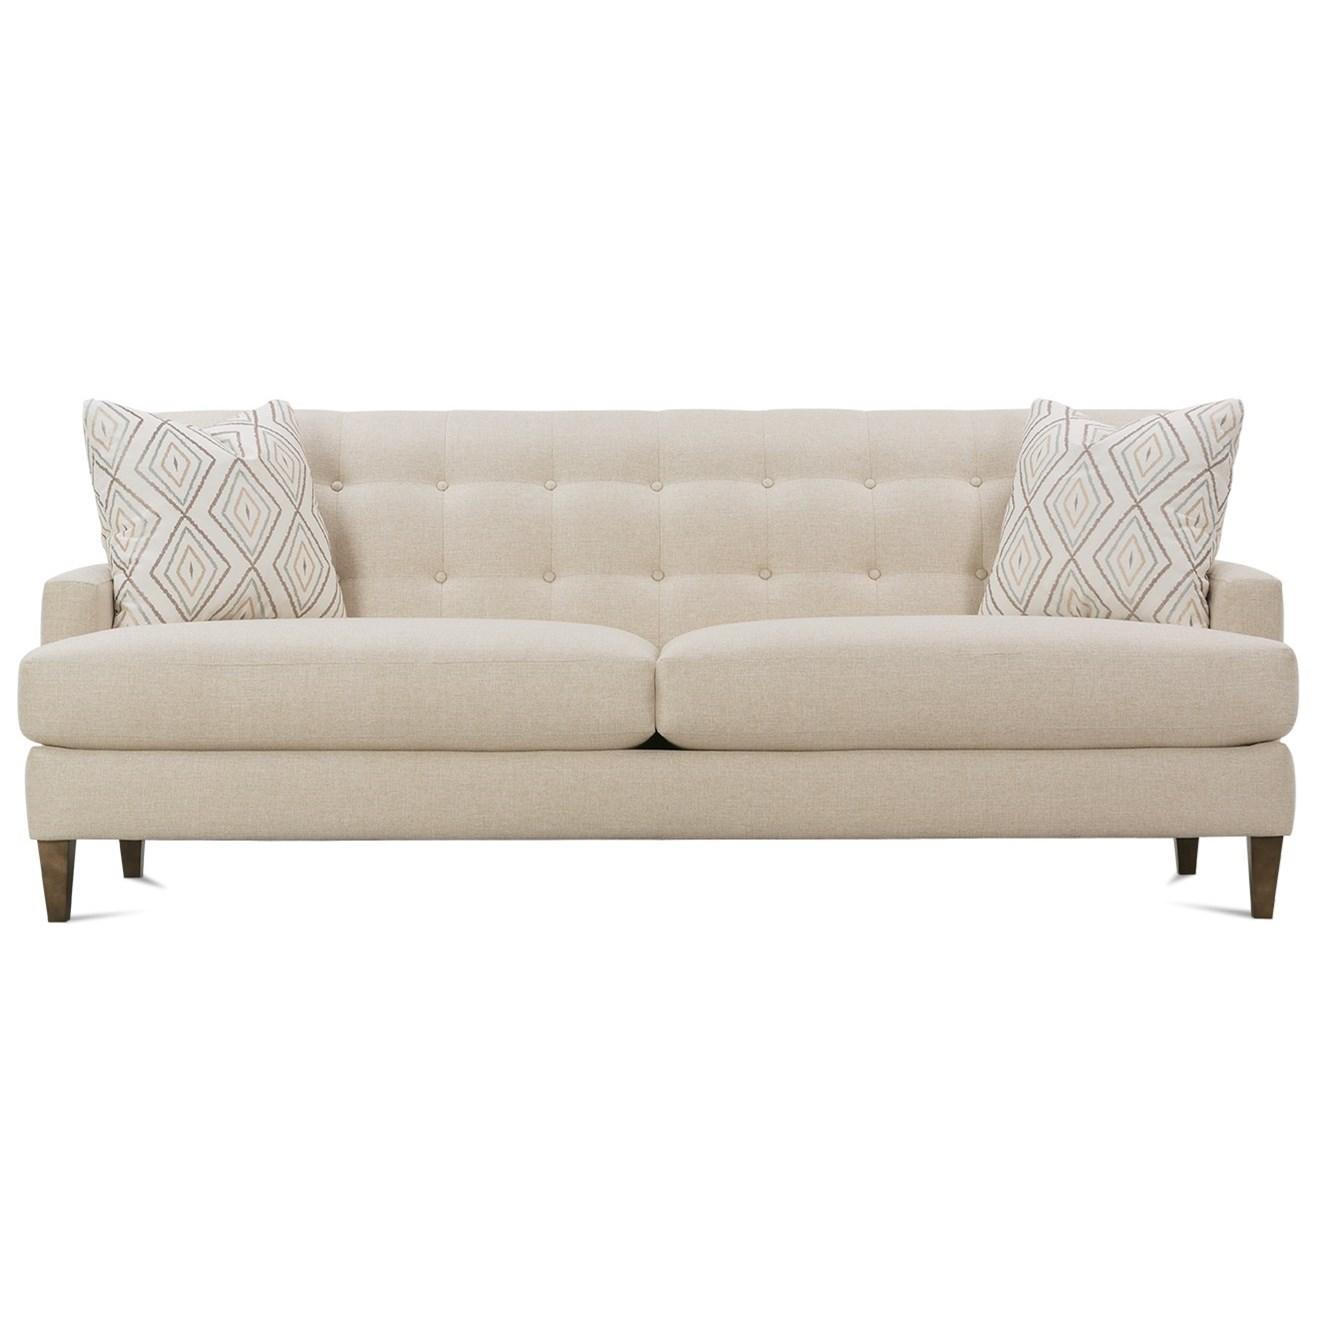 Macy Sofa by Rowe at Baer's Furniture